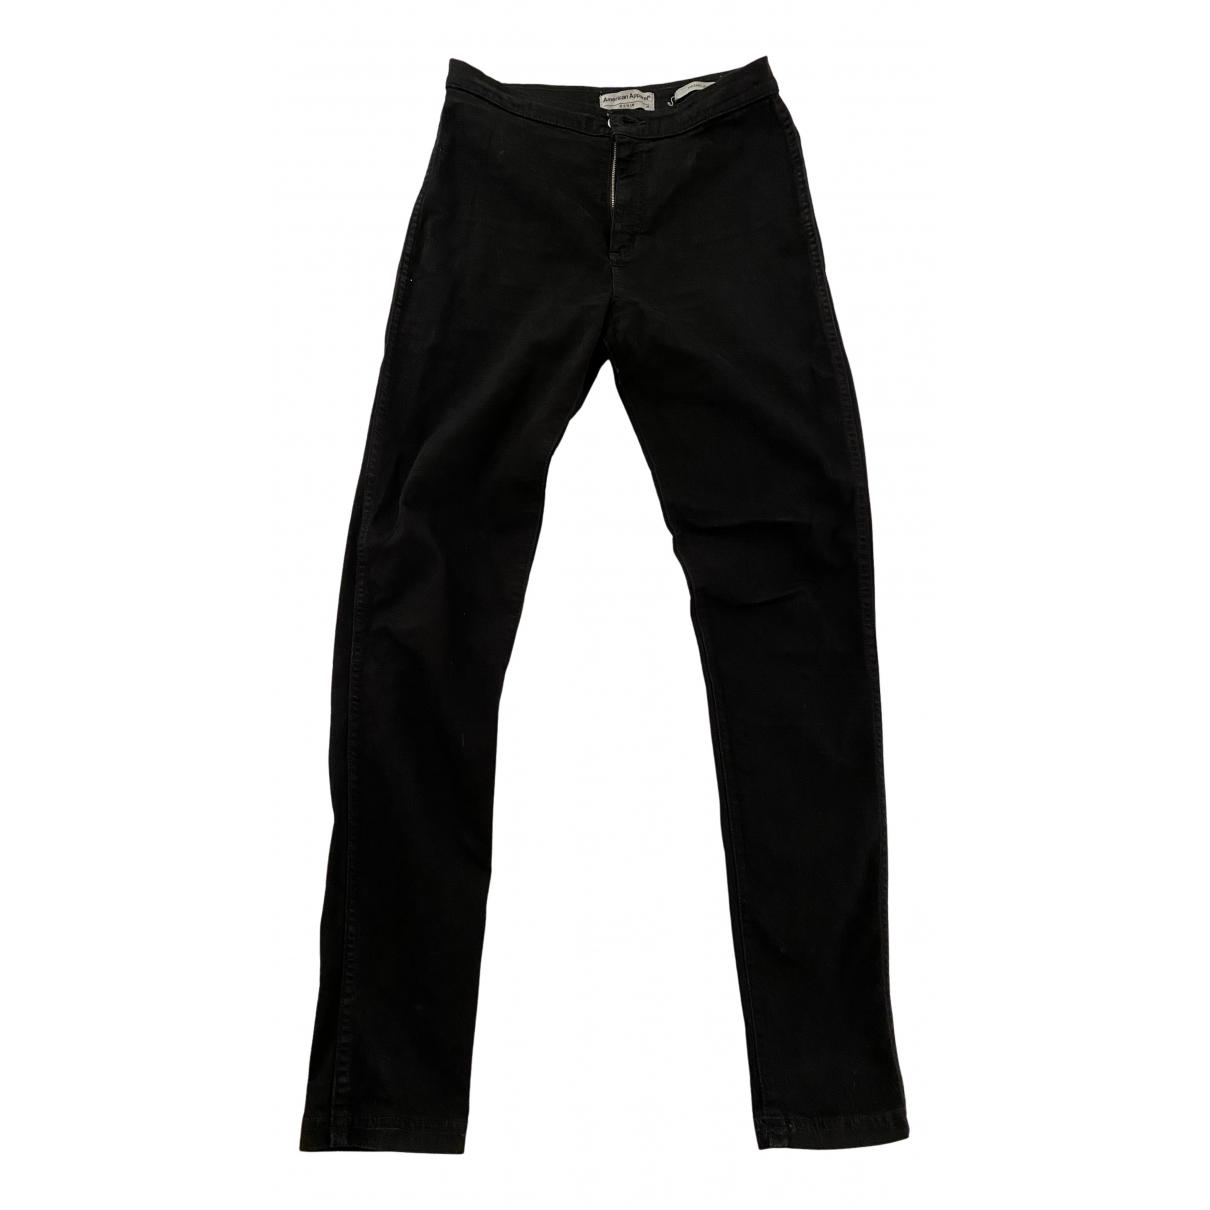 American Apparel N Black Cotton - elasthane Jeans for Women 29 US